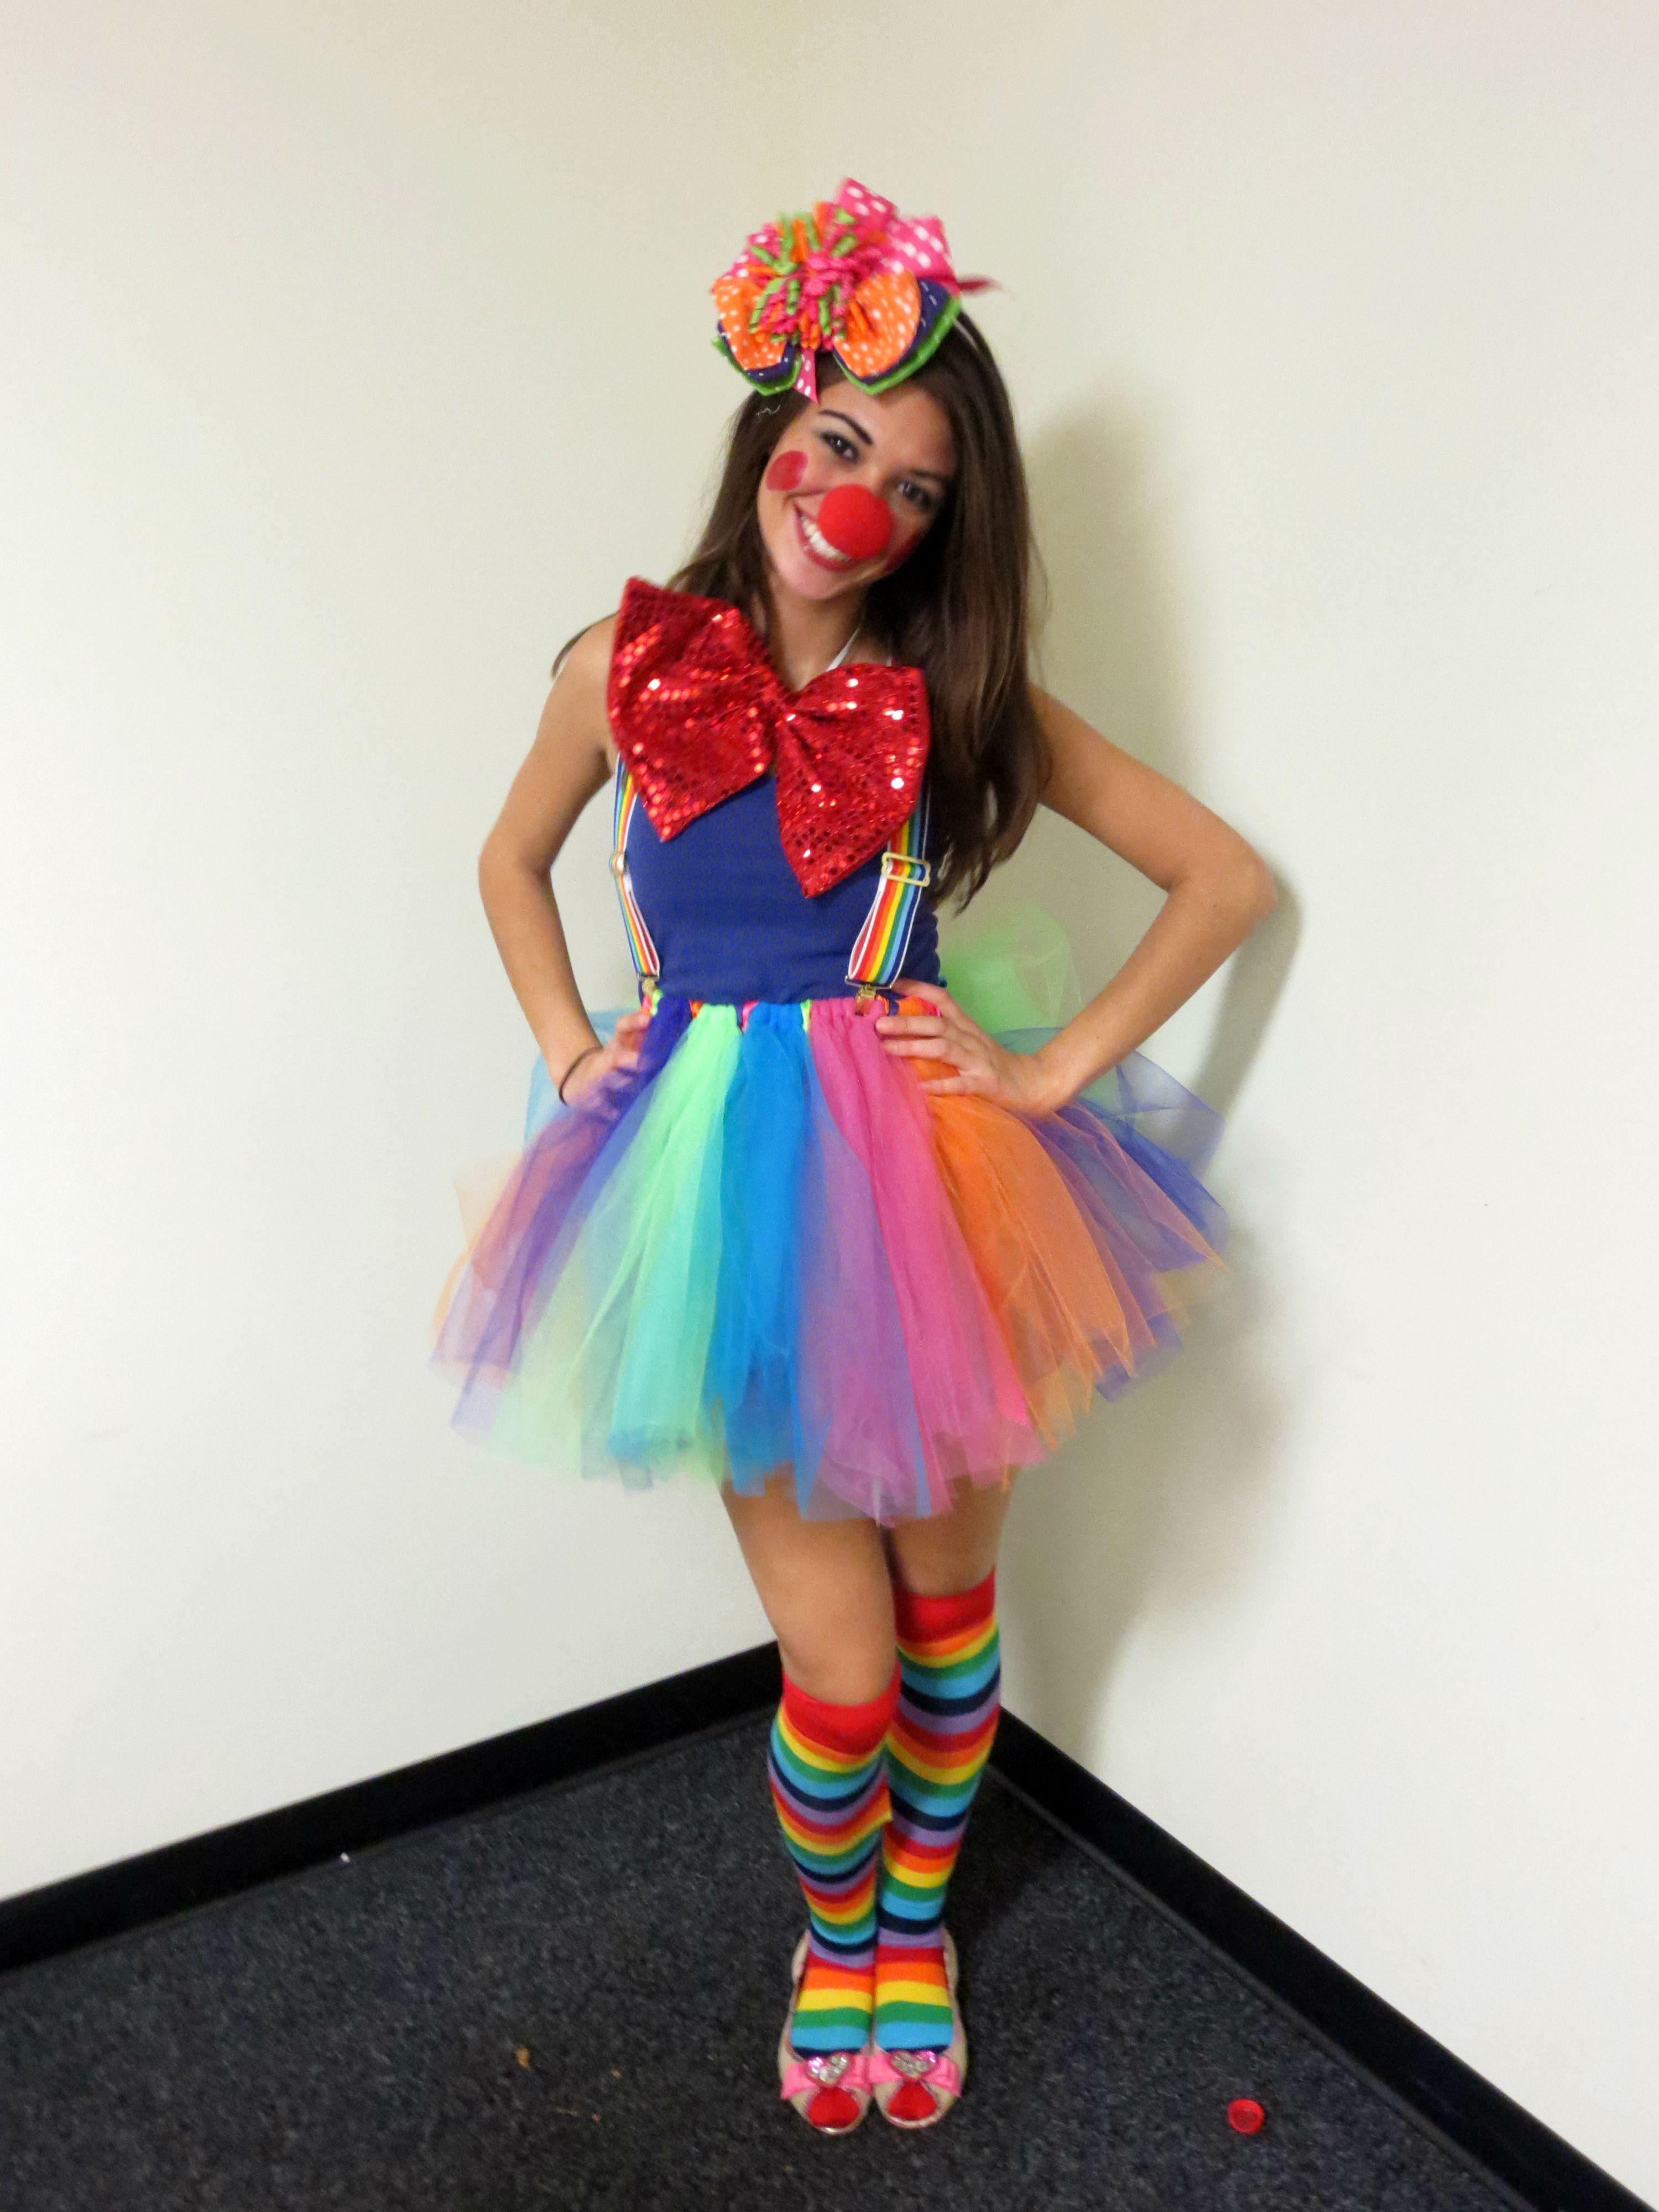 Homemade clown costume!! The fascinator and tutu were both